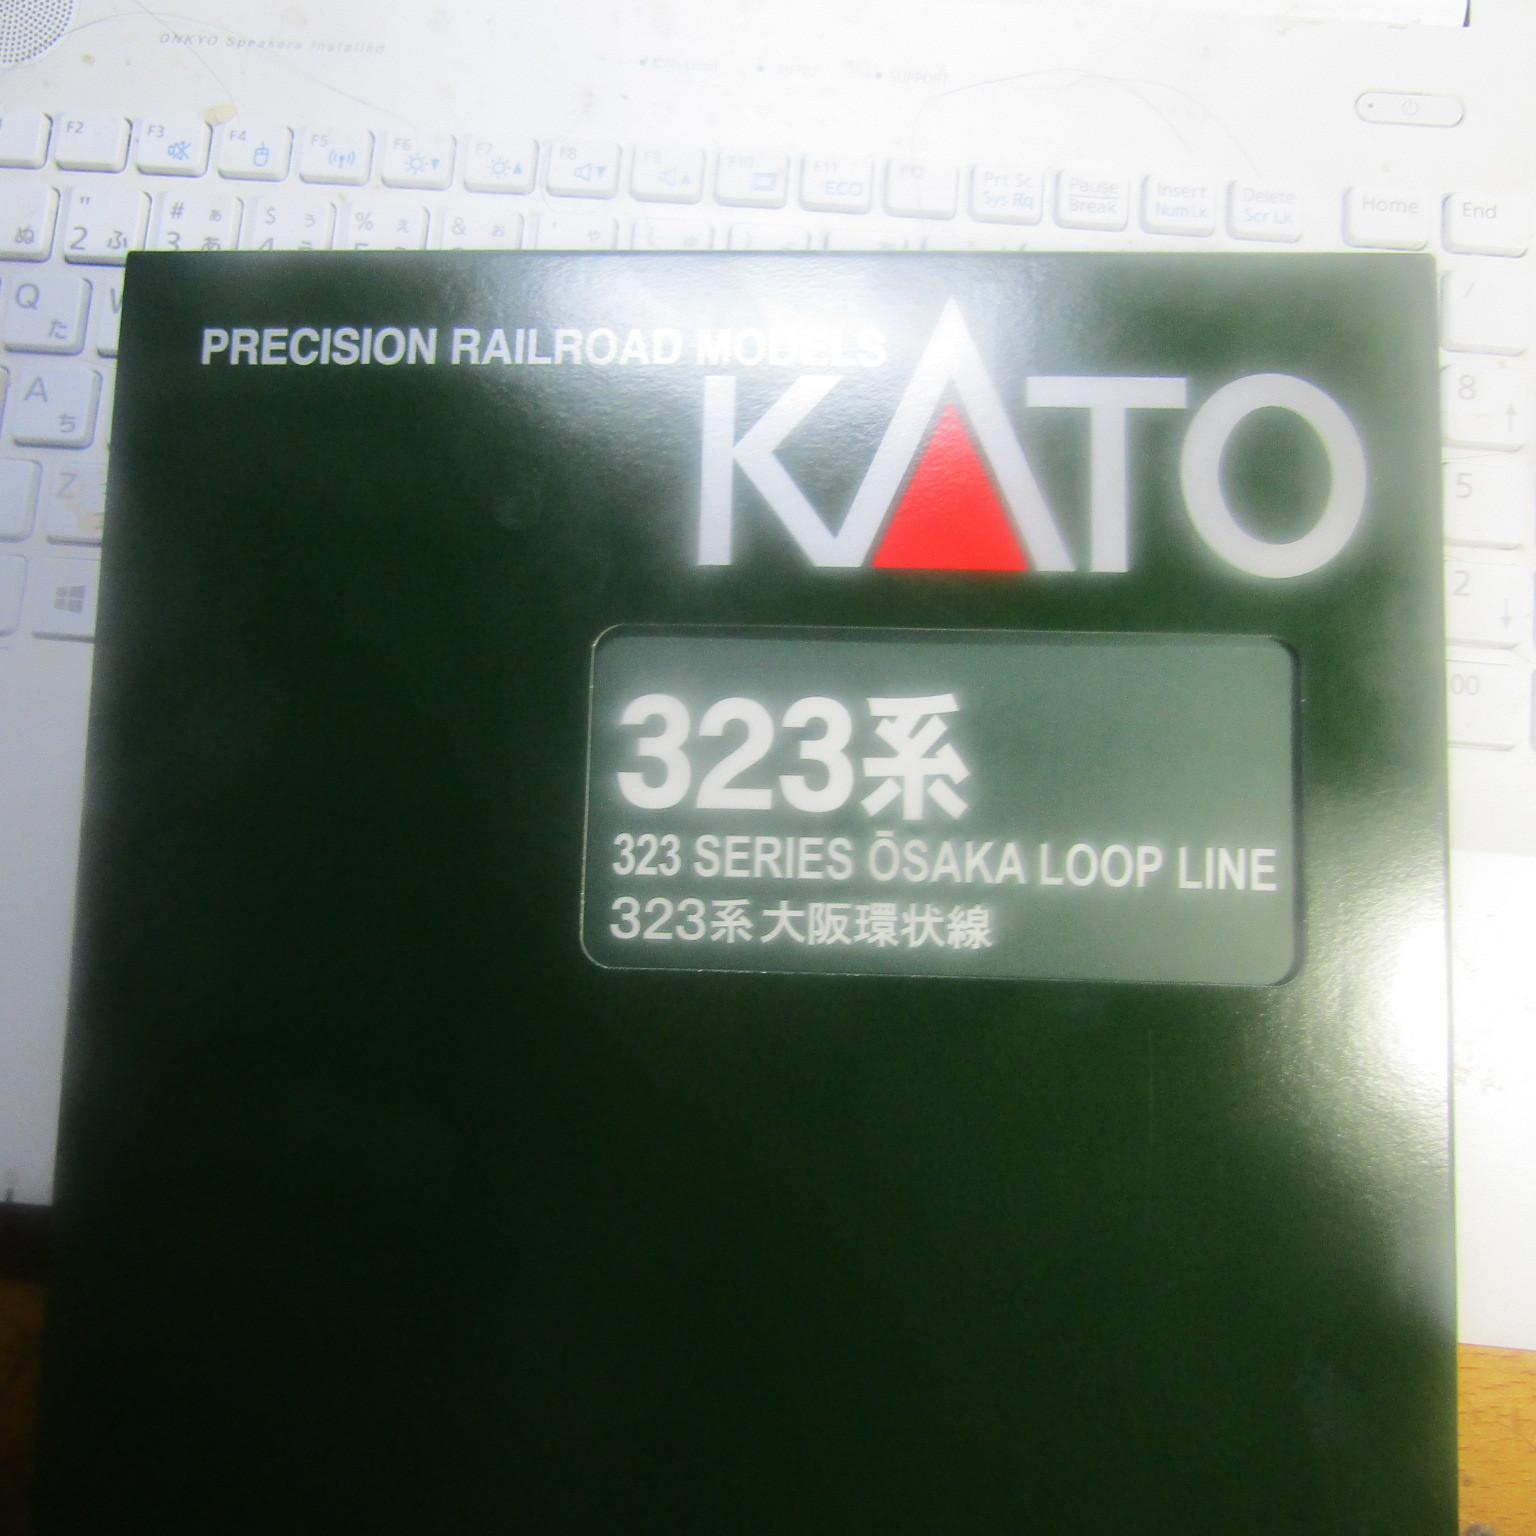 JR西日本 323系・通勤形直流電車 大阪環状線 (KATO製)